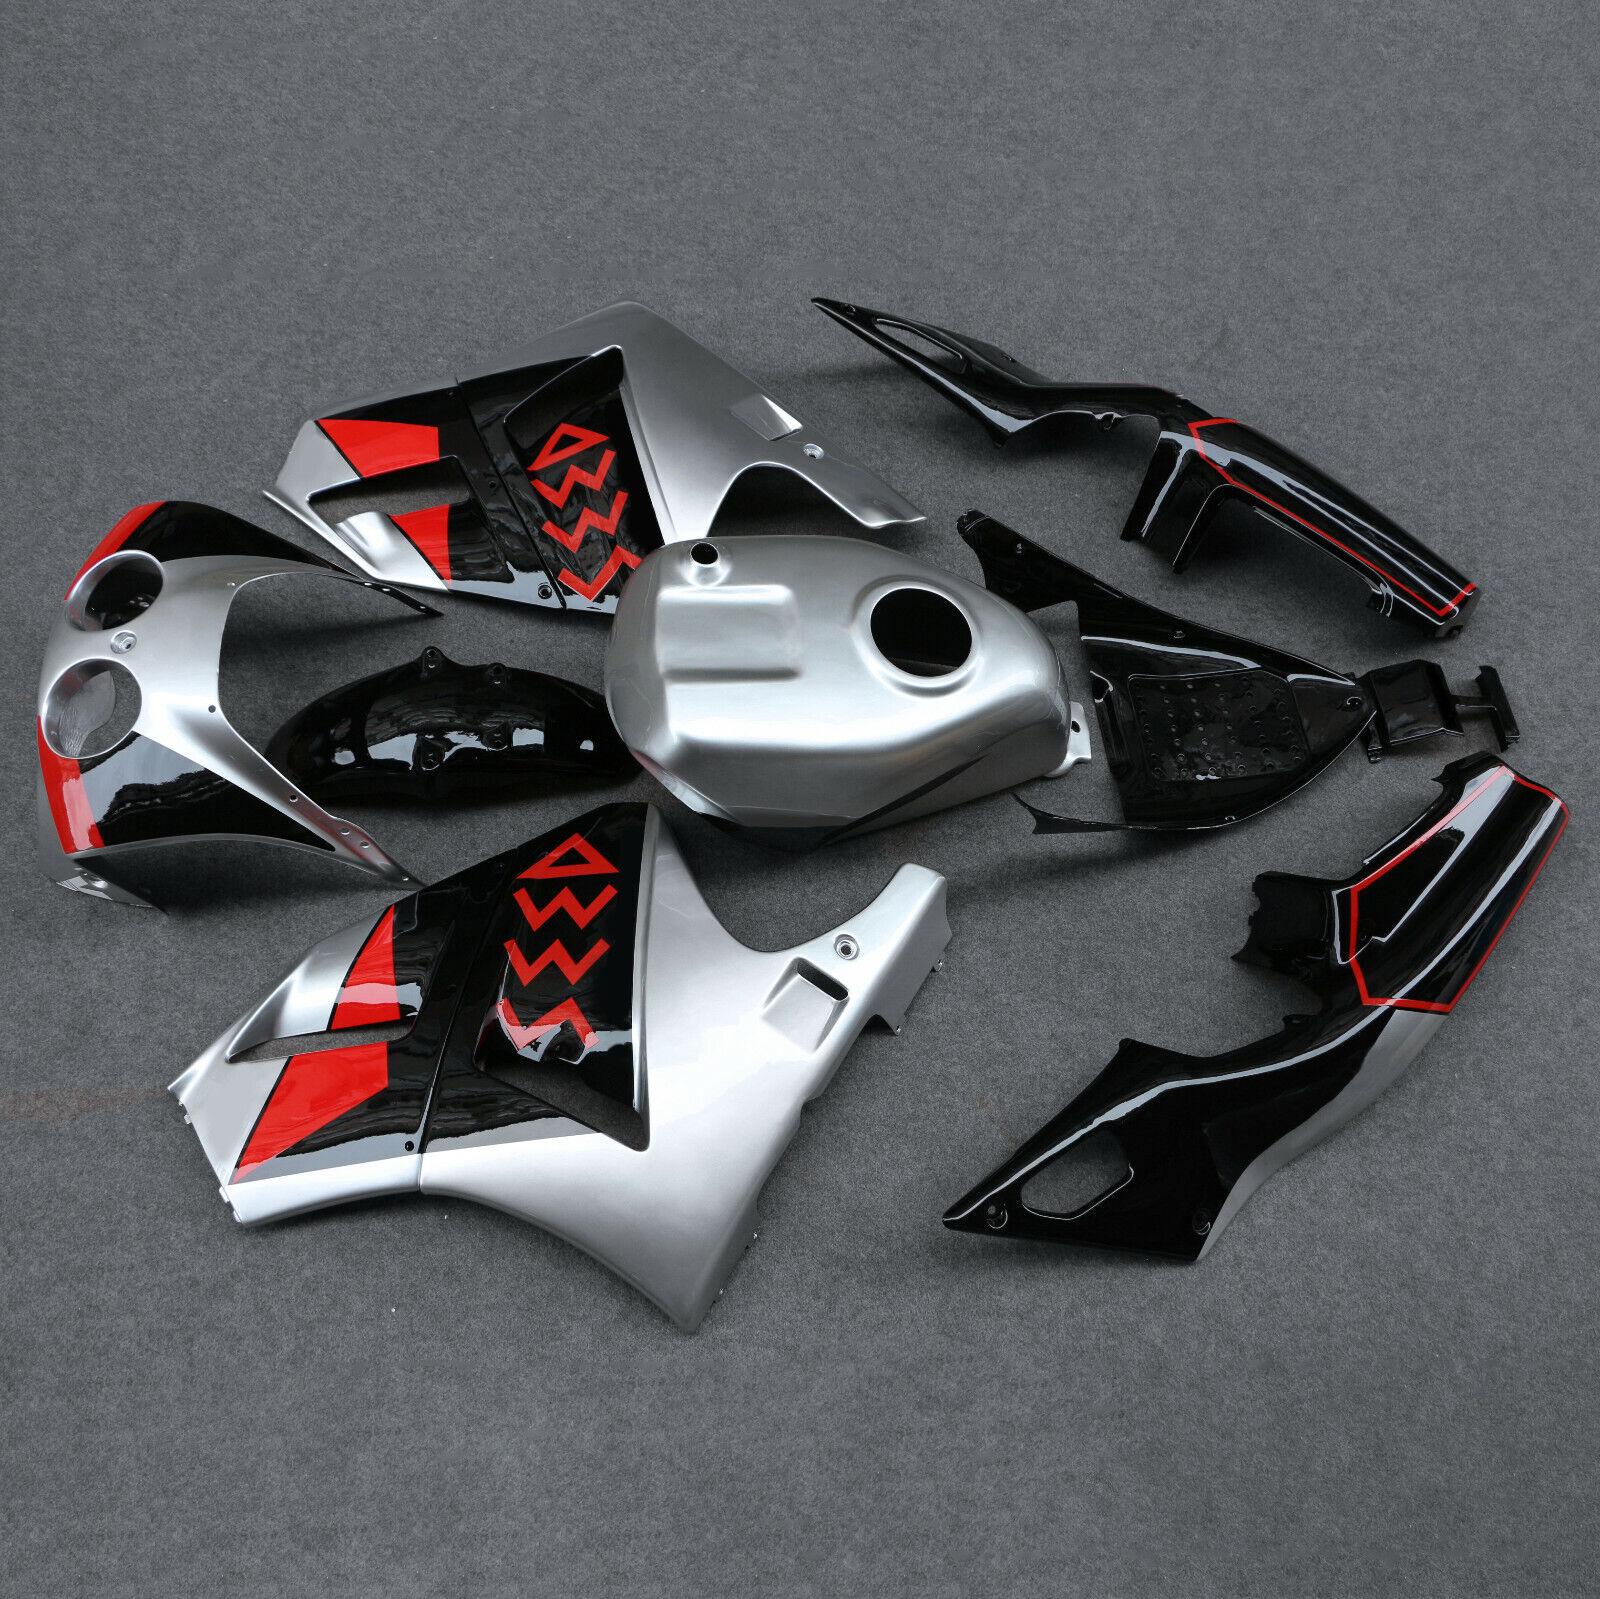 Fit for Honda VFR400 NC30 1988-1992 90 Motorcycle Fairing Bodywork Kit Panel Set